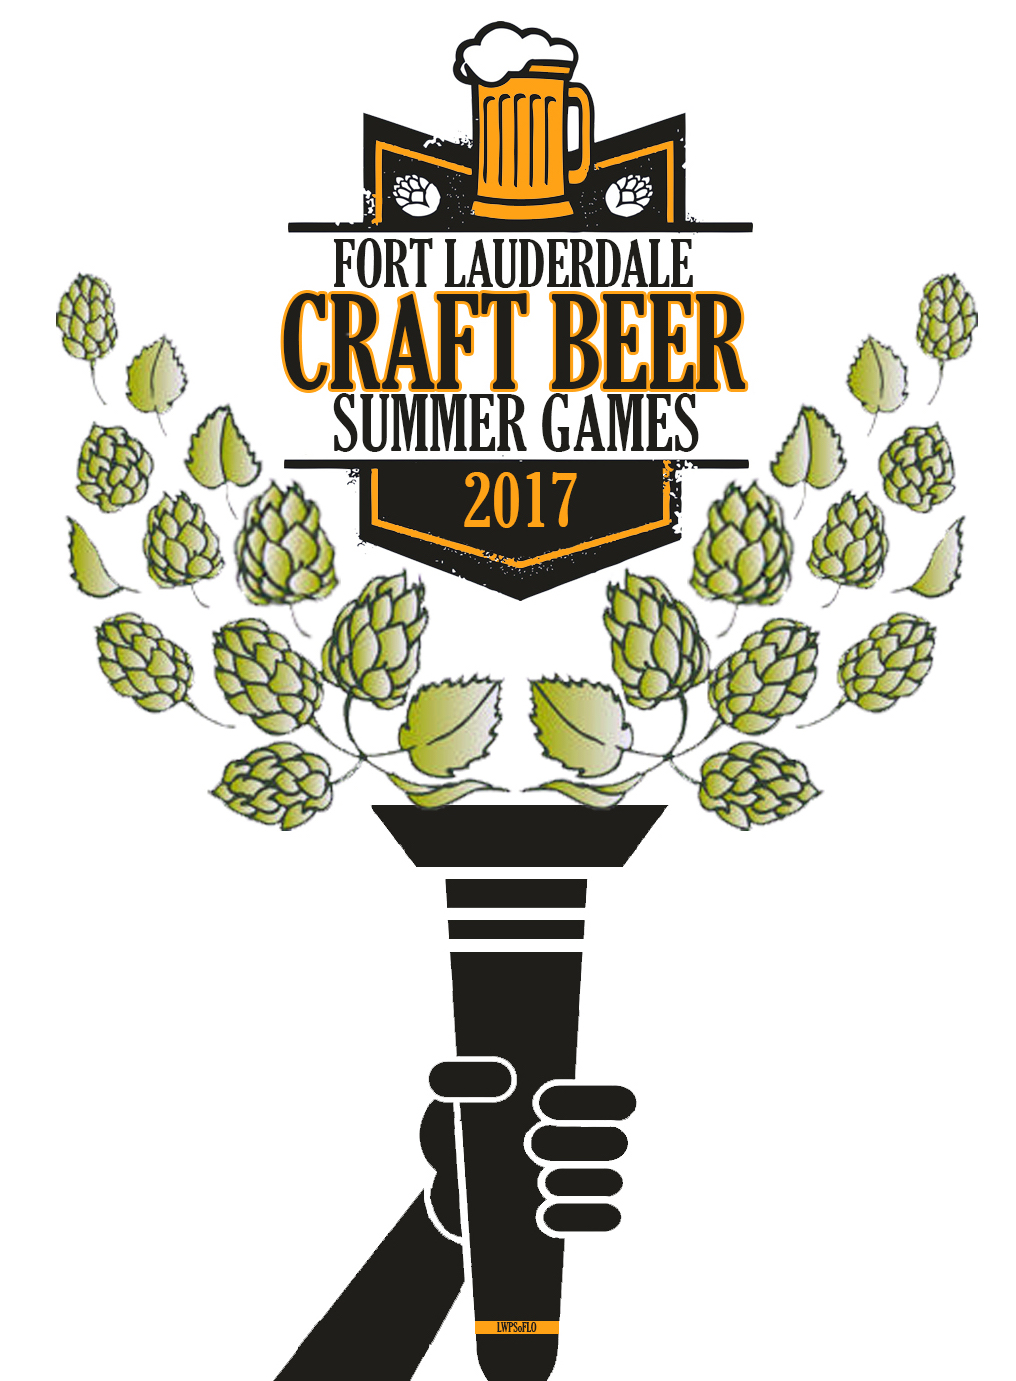 Fort lauderdale craft beer summer games 2017 tickets sat for Craft beer market share 2017